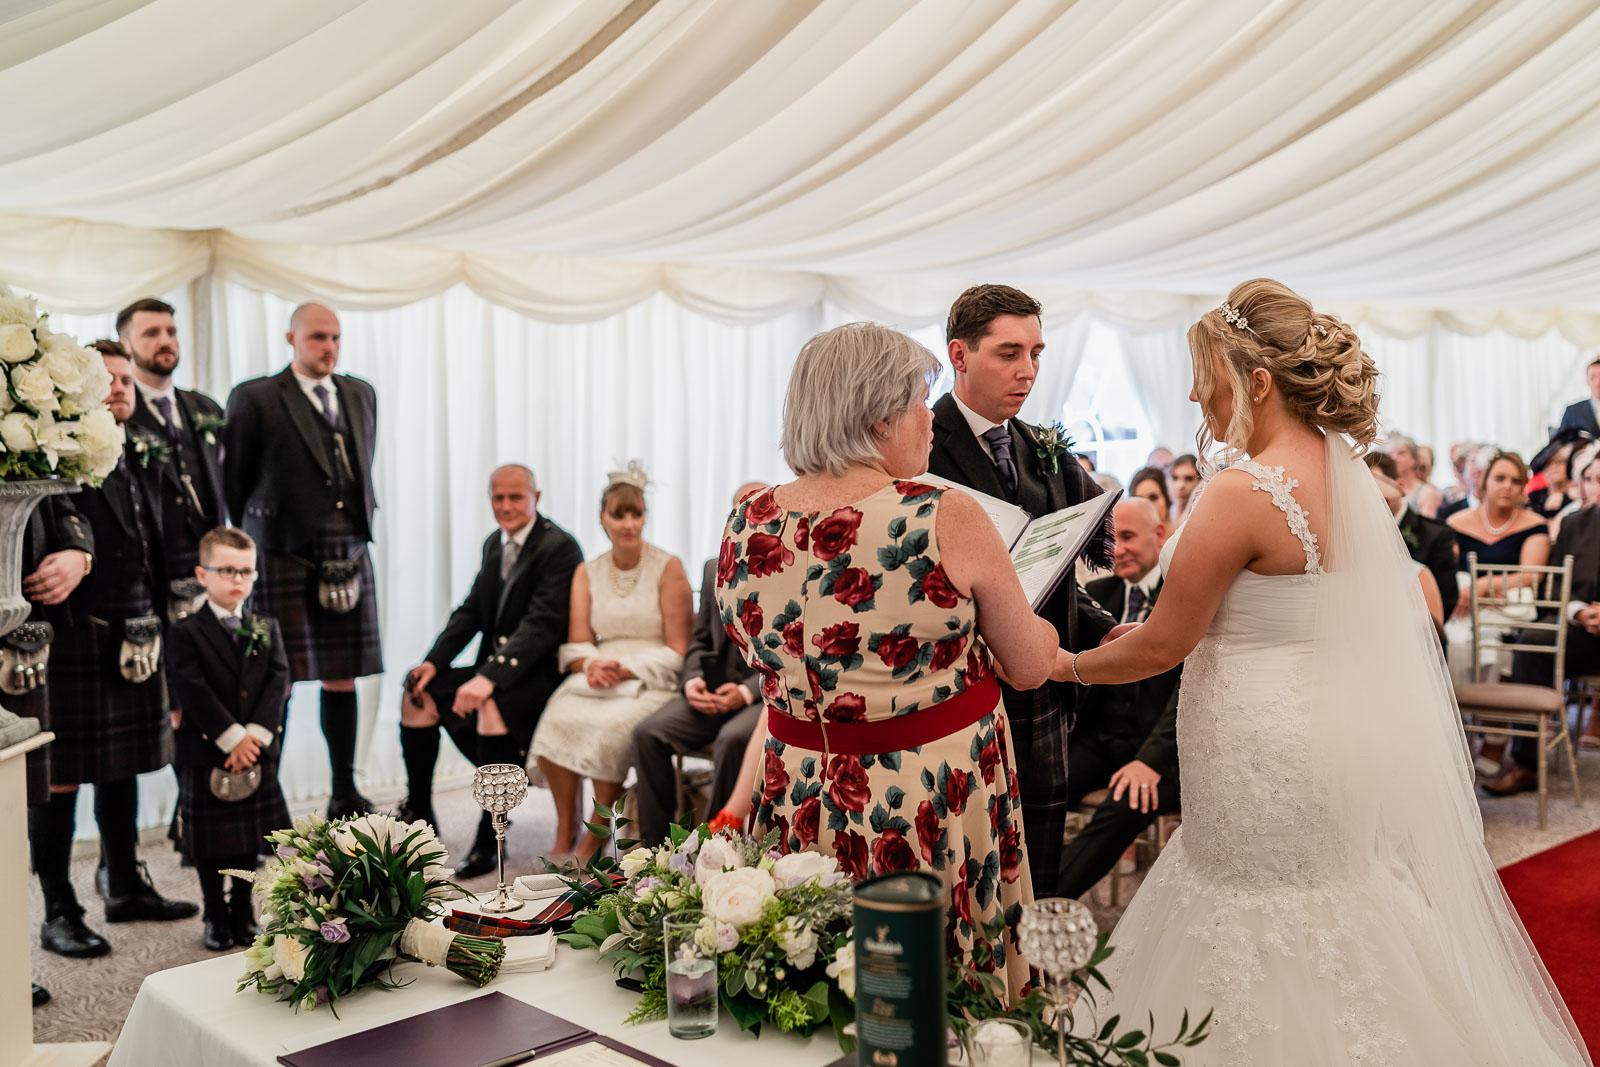 cornhill_castle_wedding_biggar_dearlyphotography (110 of 448).jpg